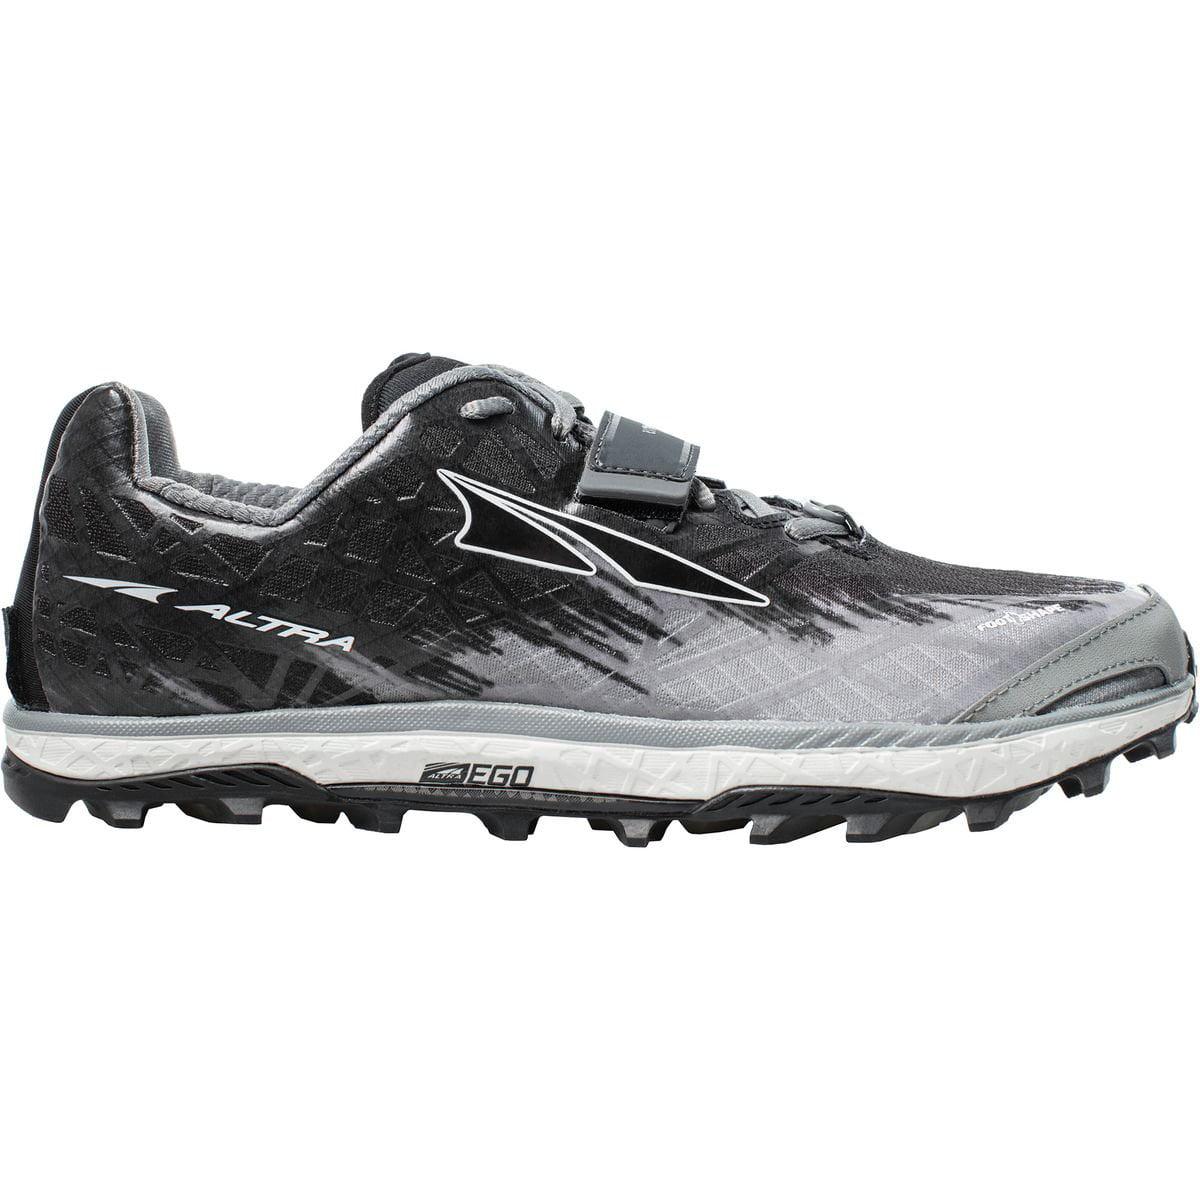 Altra Women's King MT 1.5 Comfort Zero Drop Trail Running